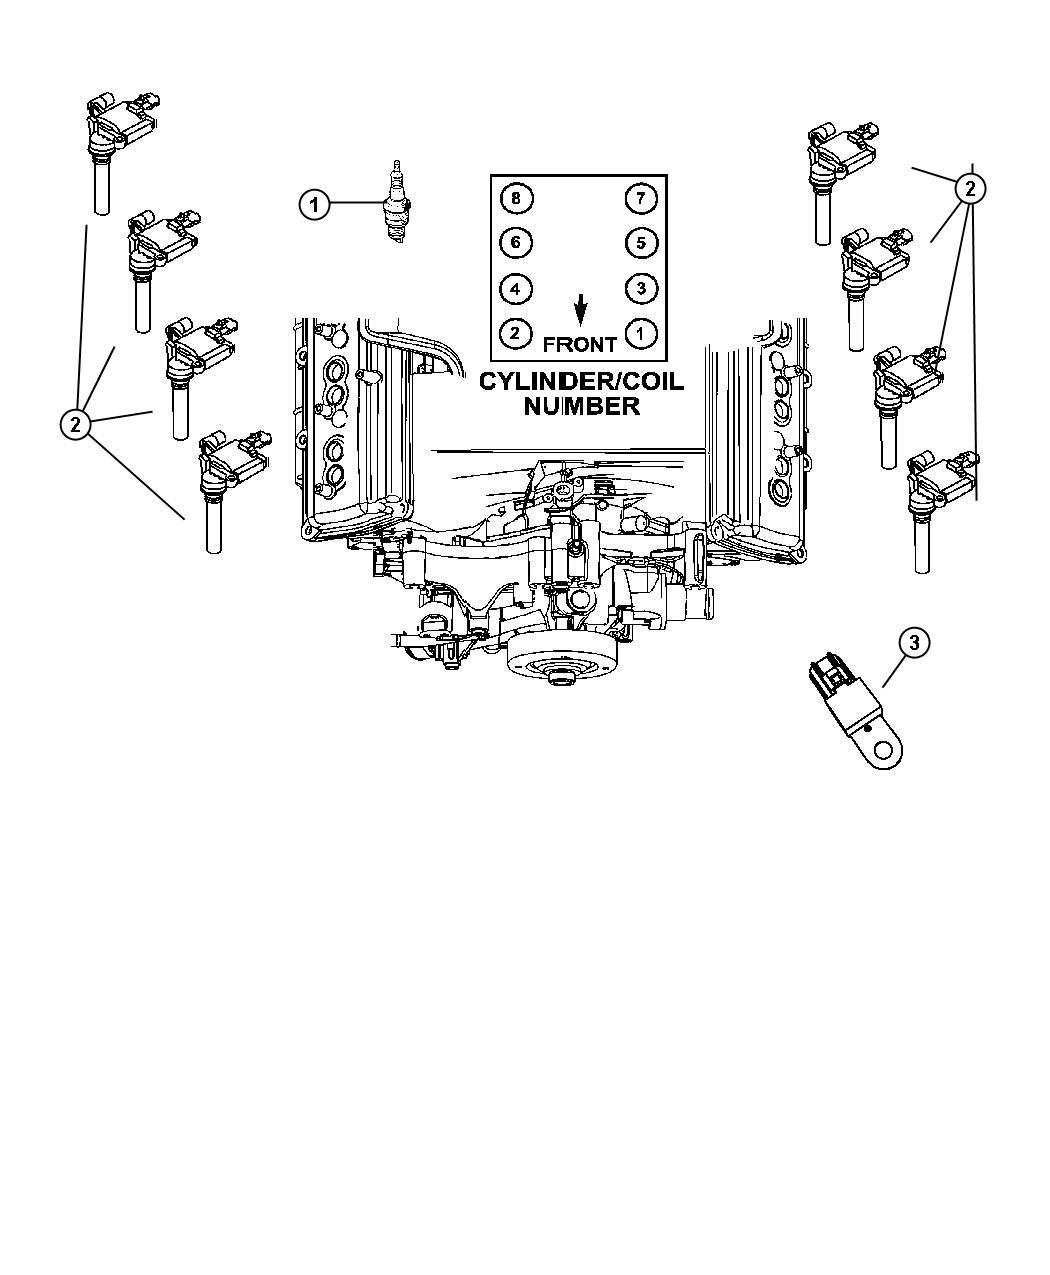 Jeep Grand Cherokee Spark Plug Ignition Plugs